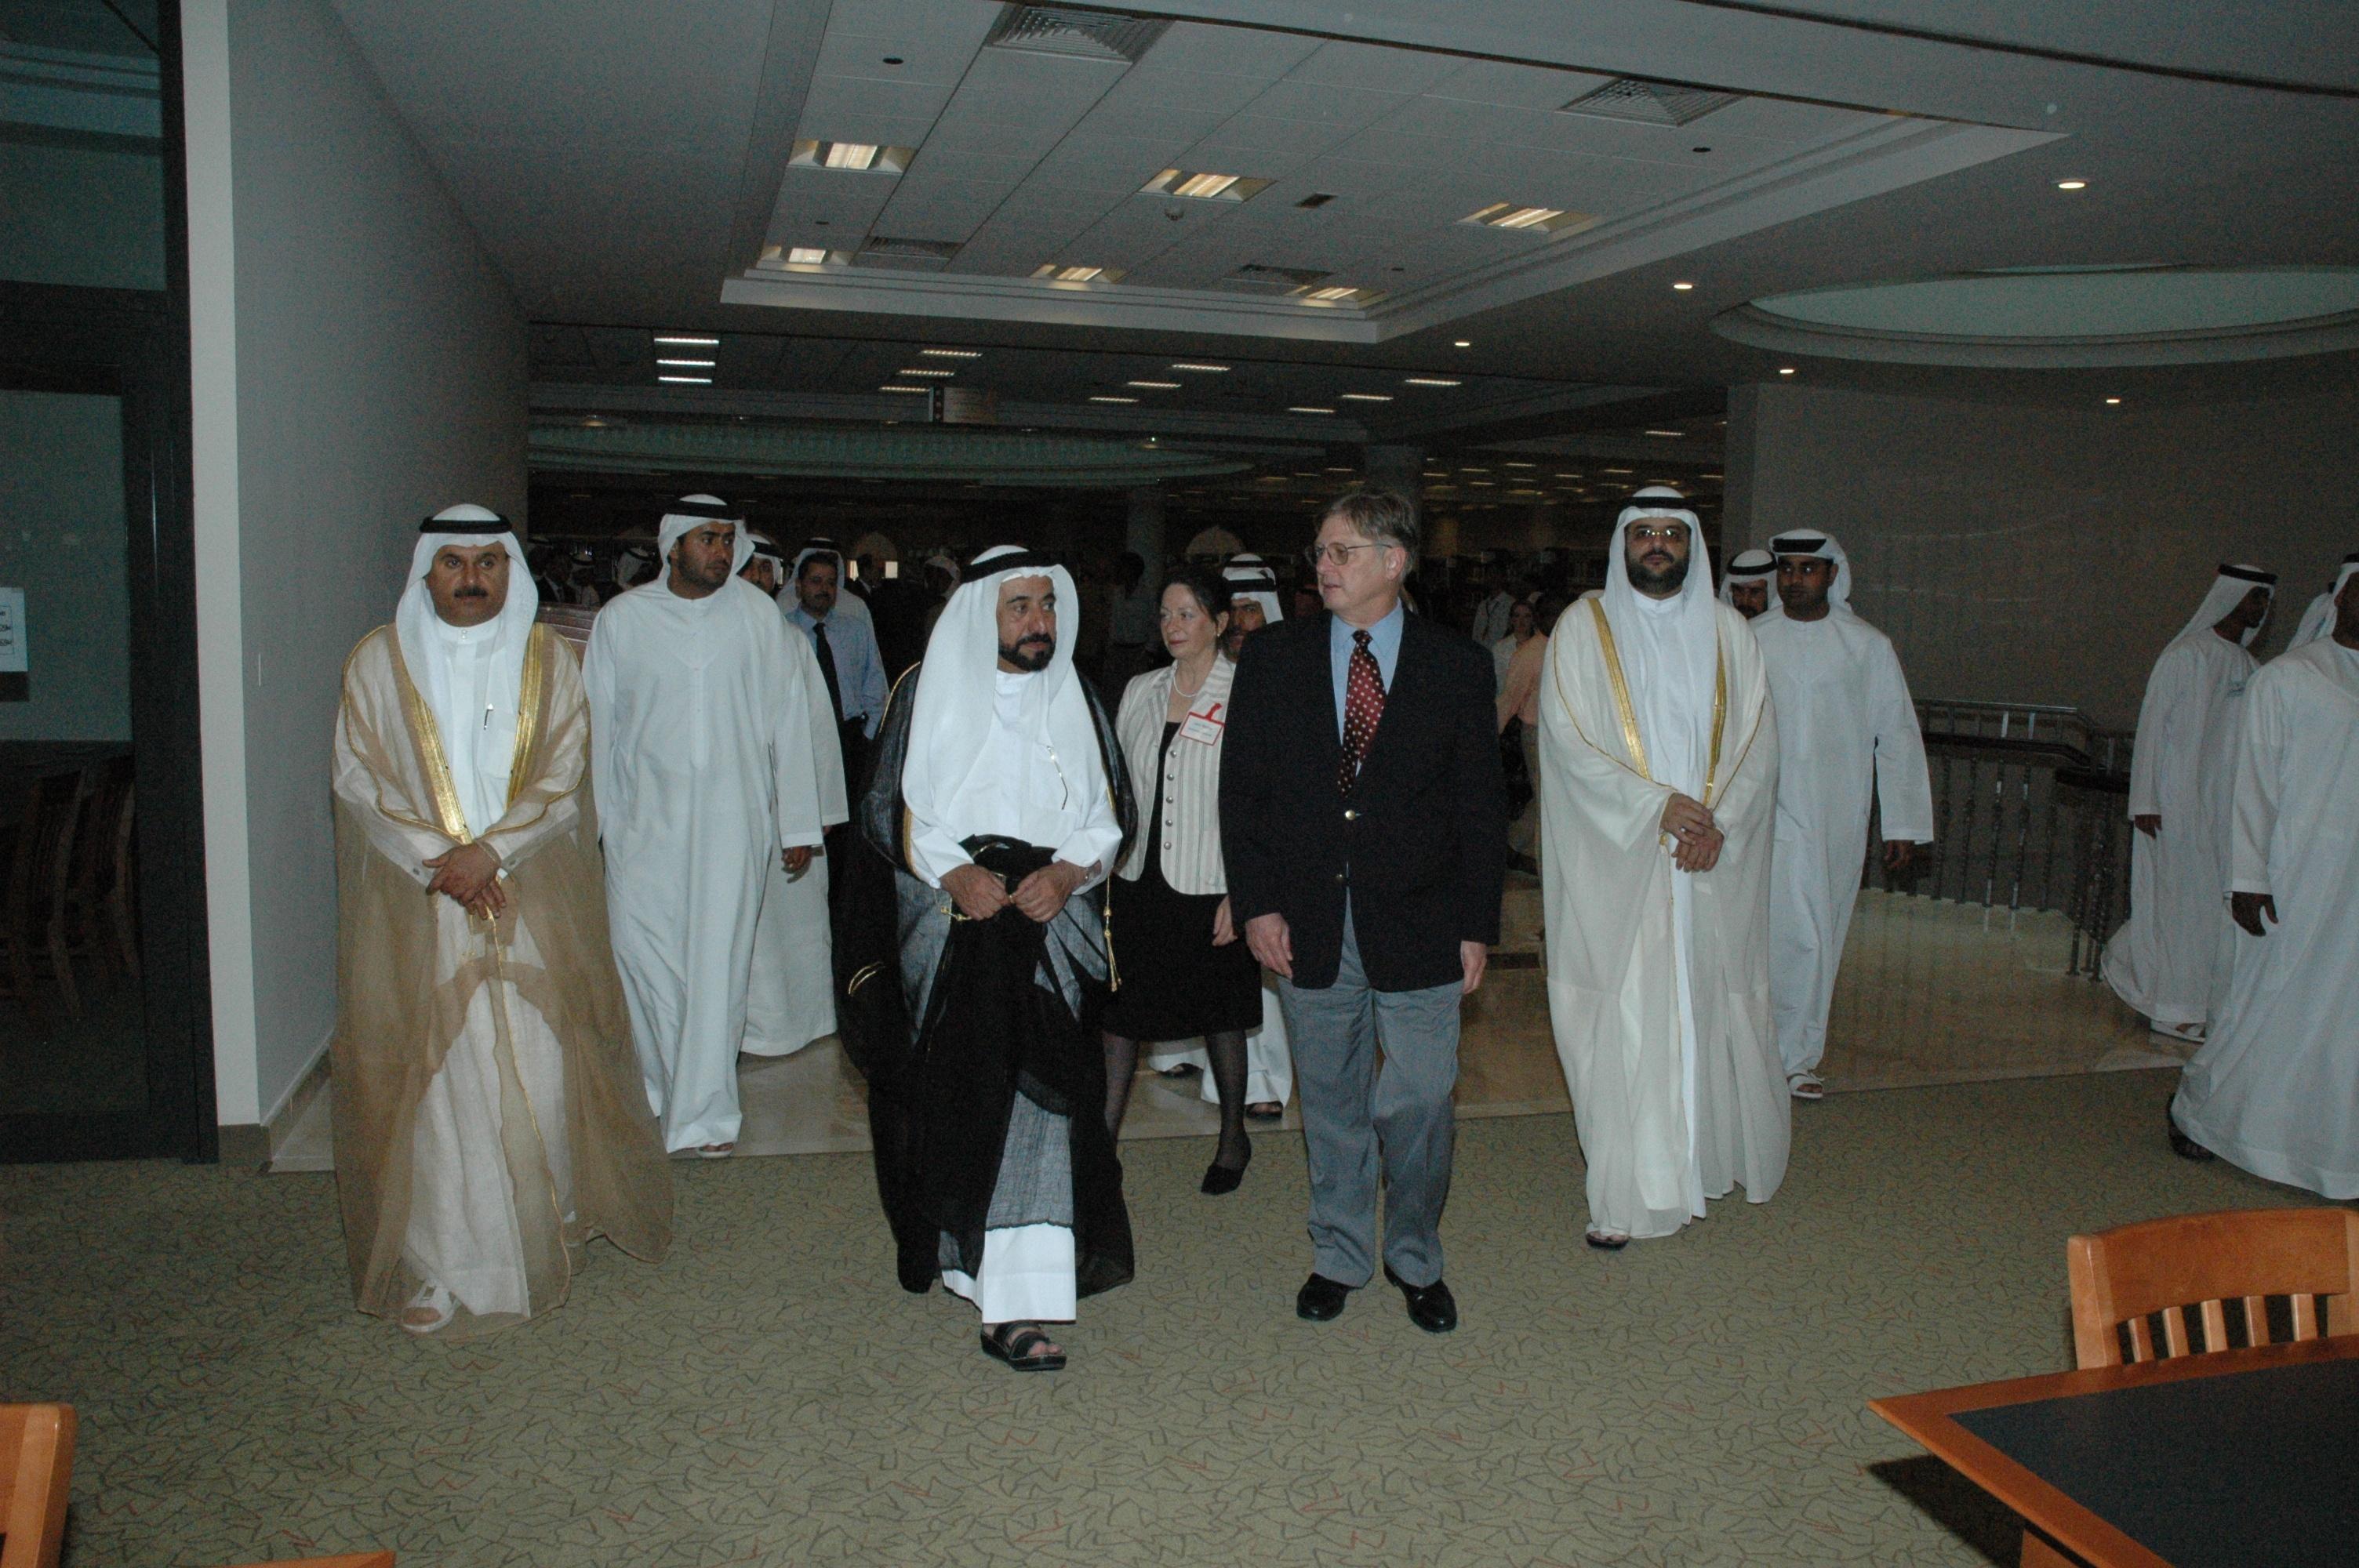 American_University_of_Sharjah_Library_8.jpg